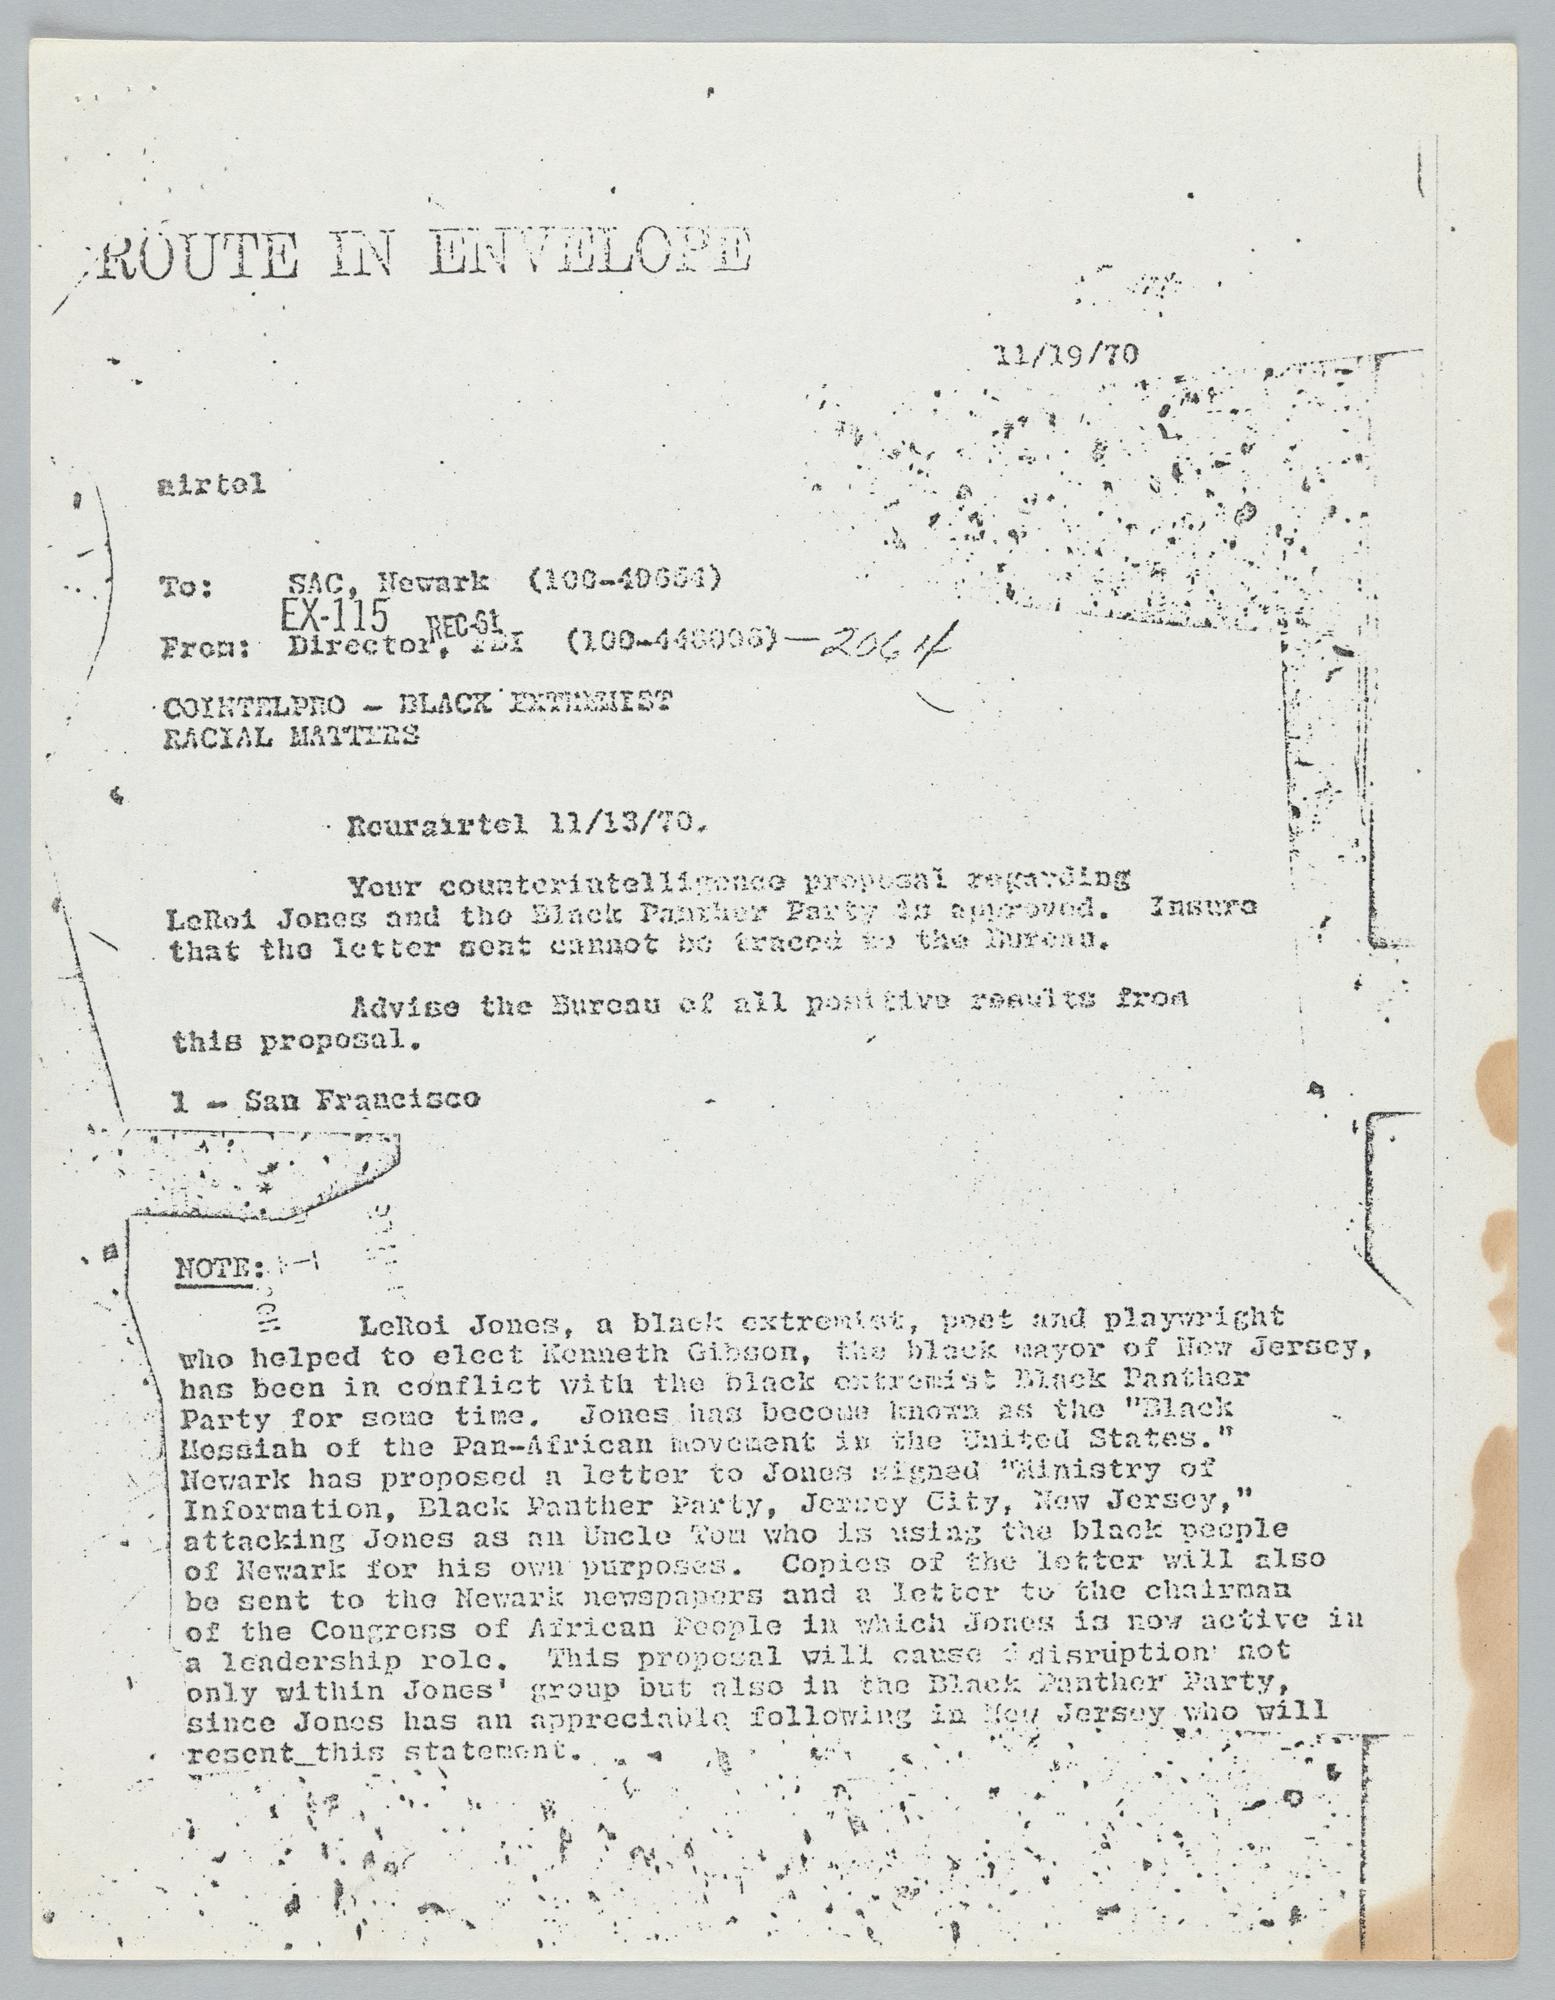 COINTELPRO memorandum